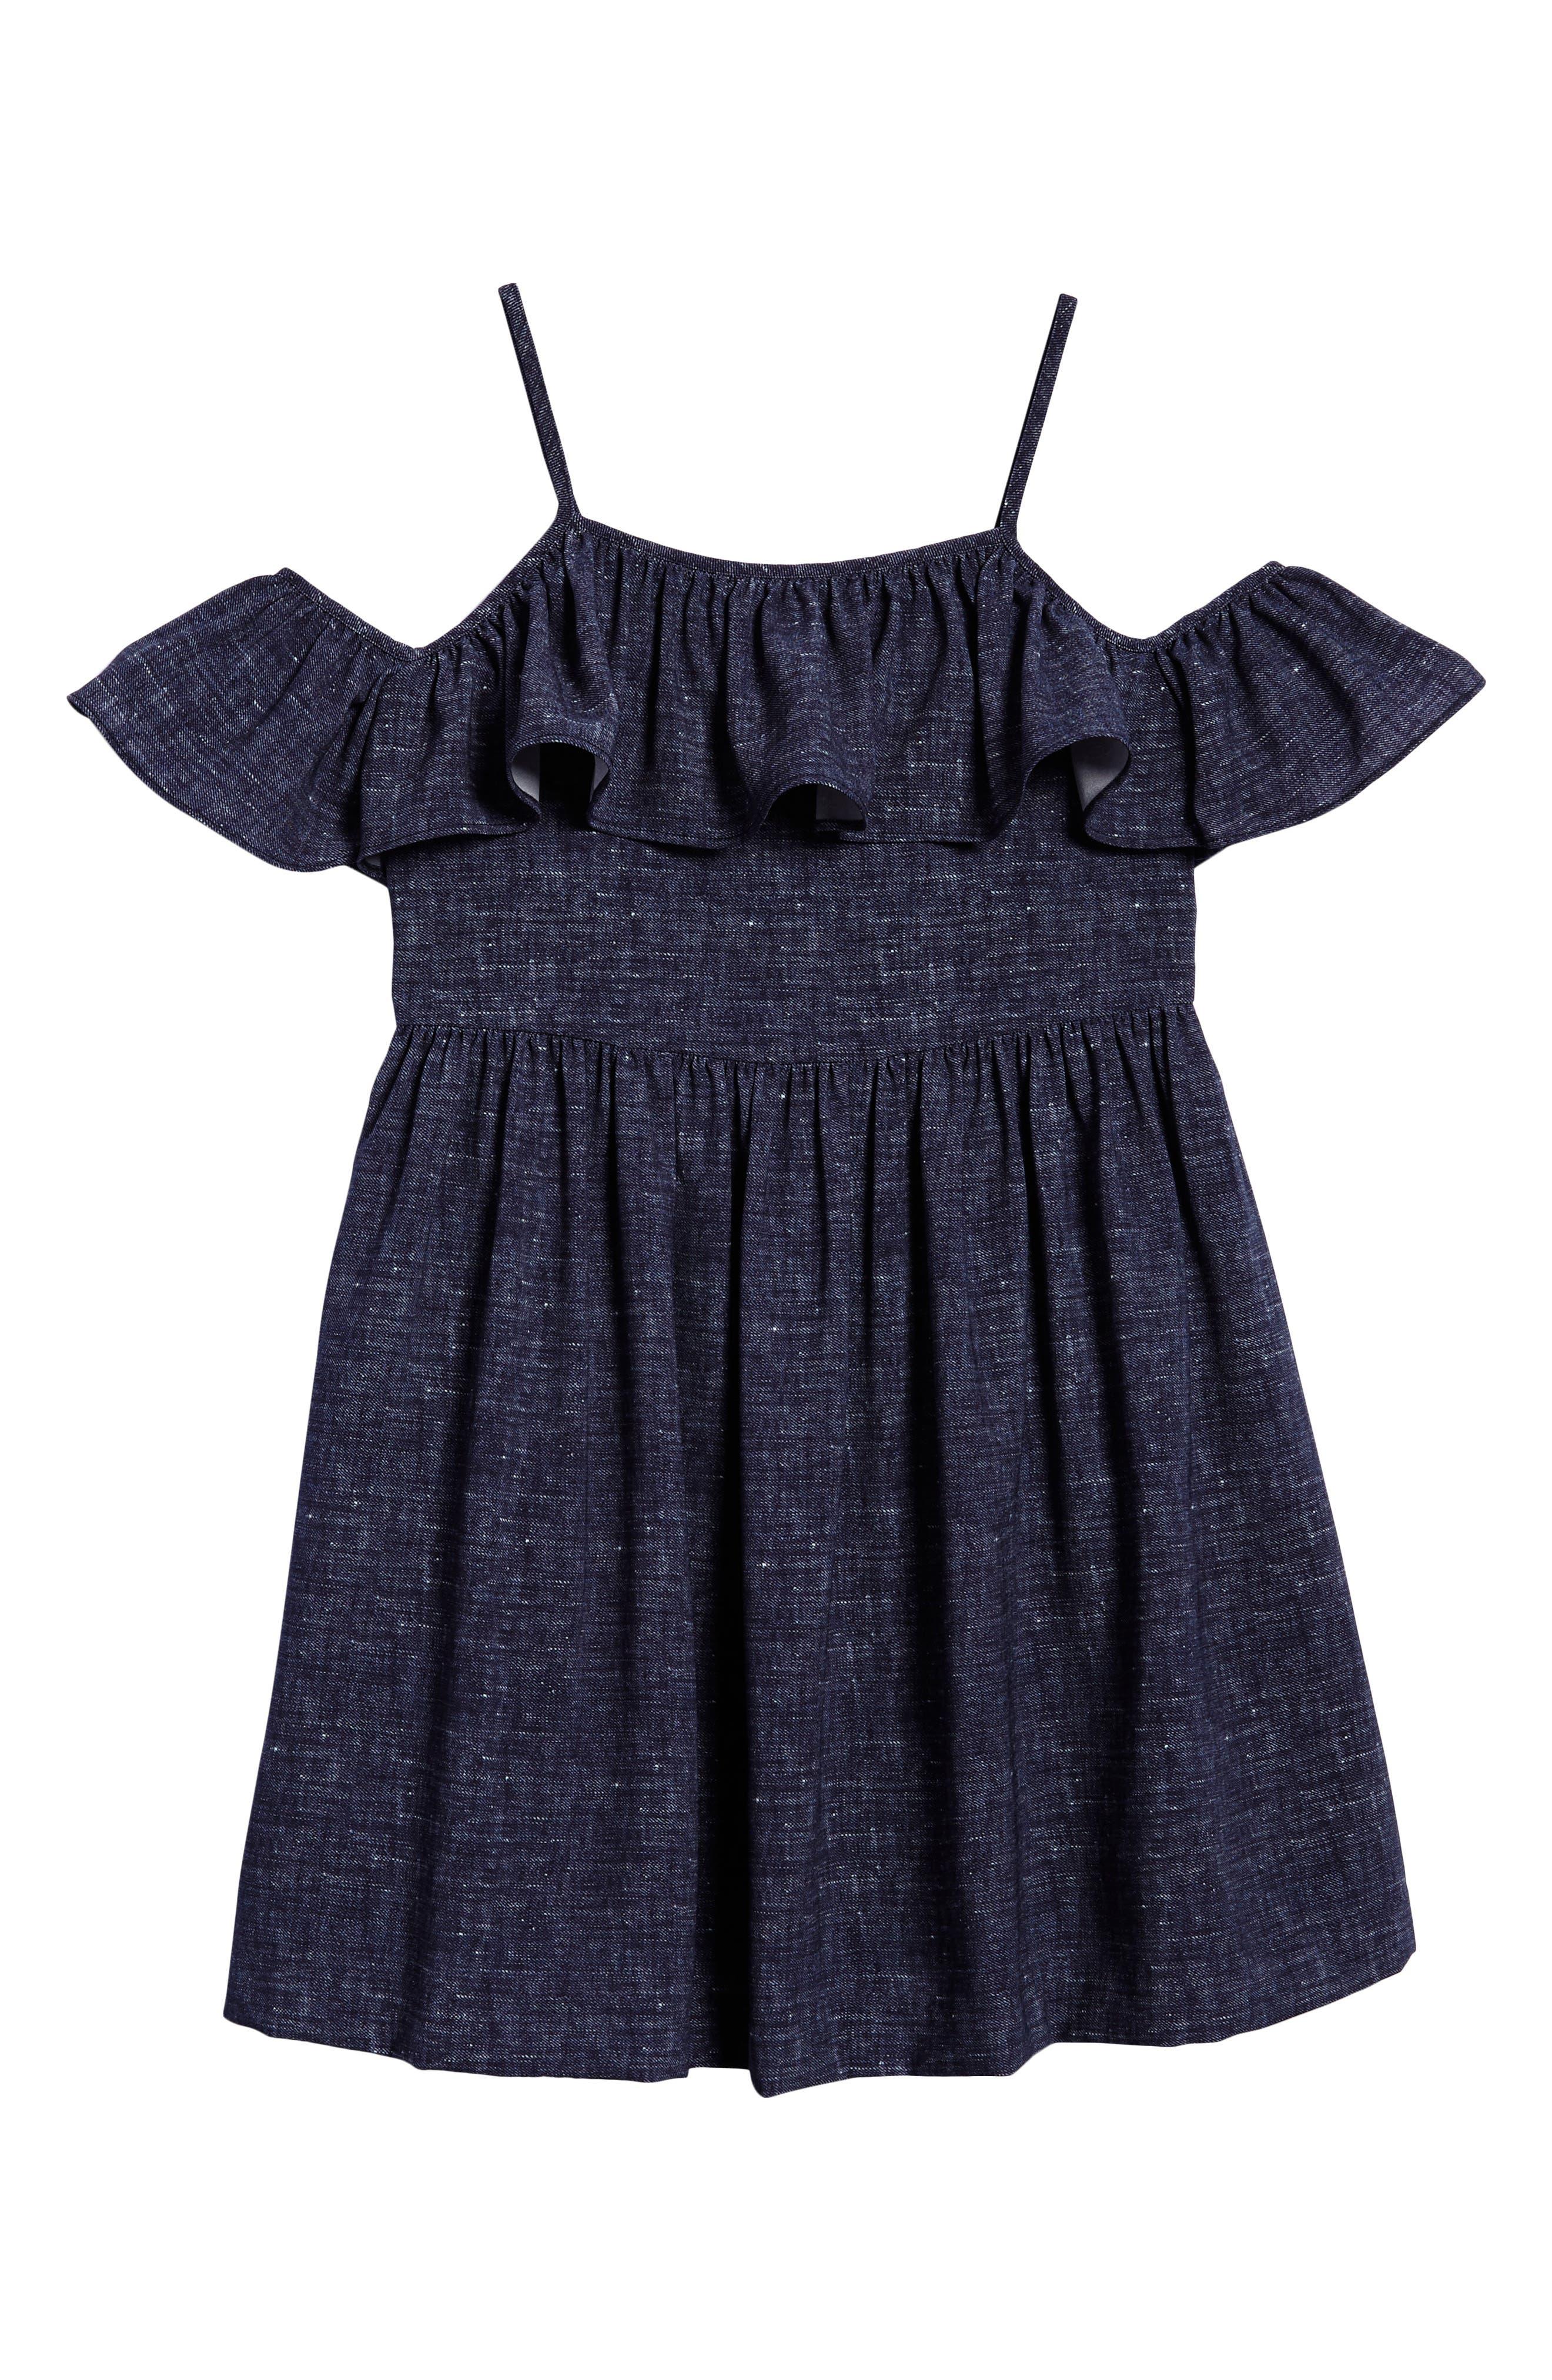 Bella Cold Shoulder Dress,                         Main,                         color, 464